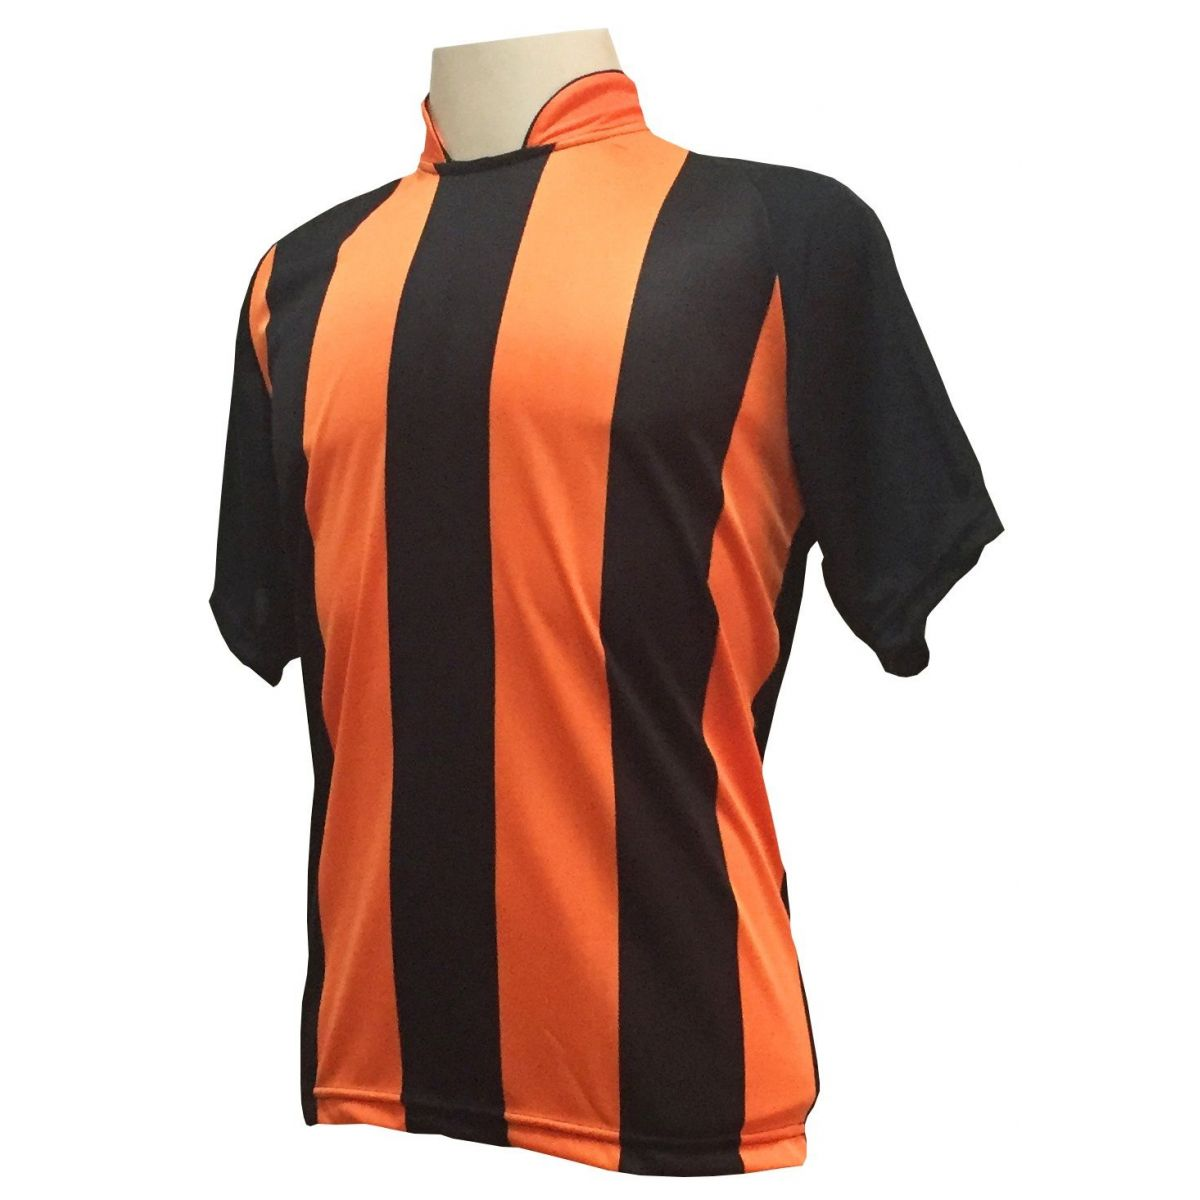 Jogo de Camisa com 12 unidades modelo Milan Preto/Laranja